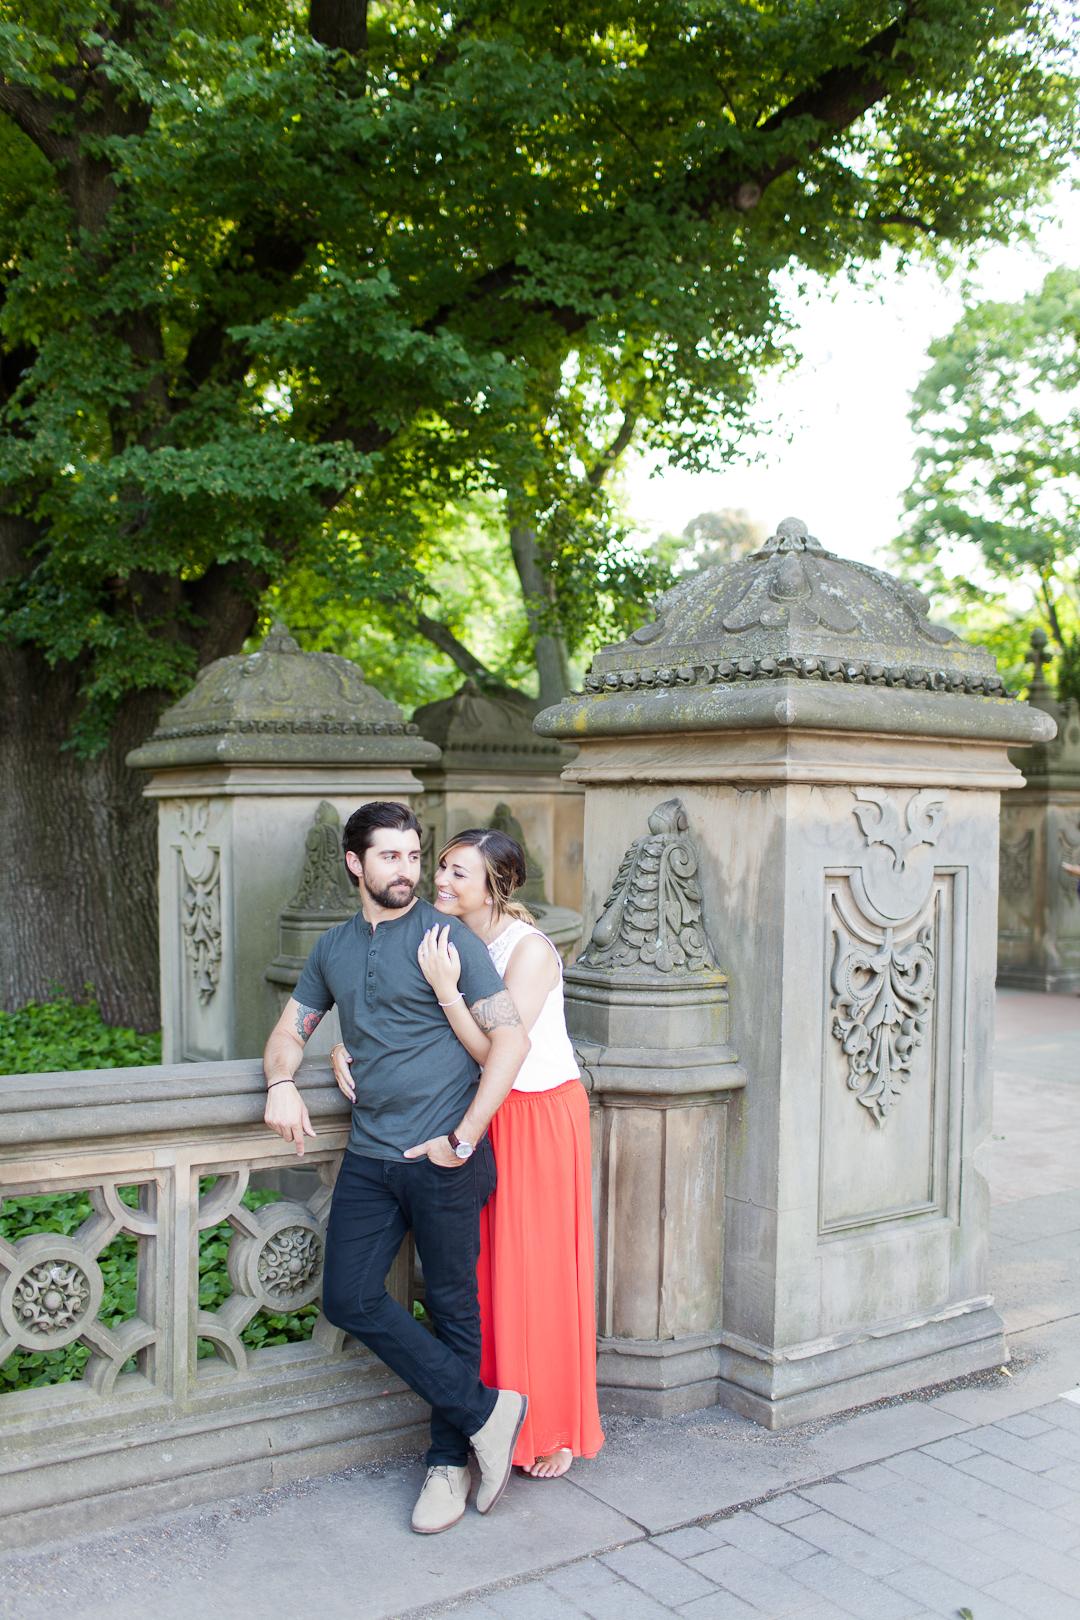 Melissa Kruse Photography - Eileen & Kenny Engagement Photos-71.jpg